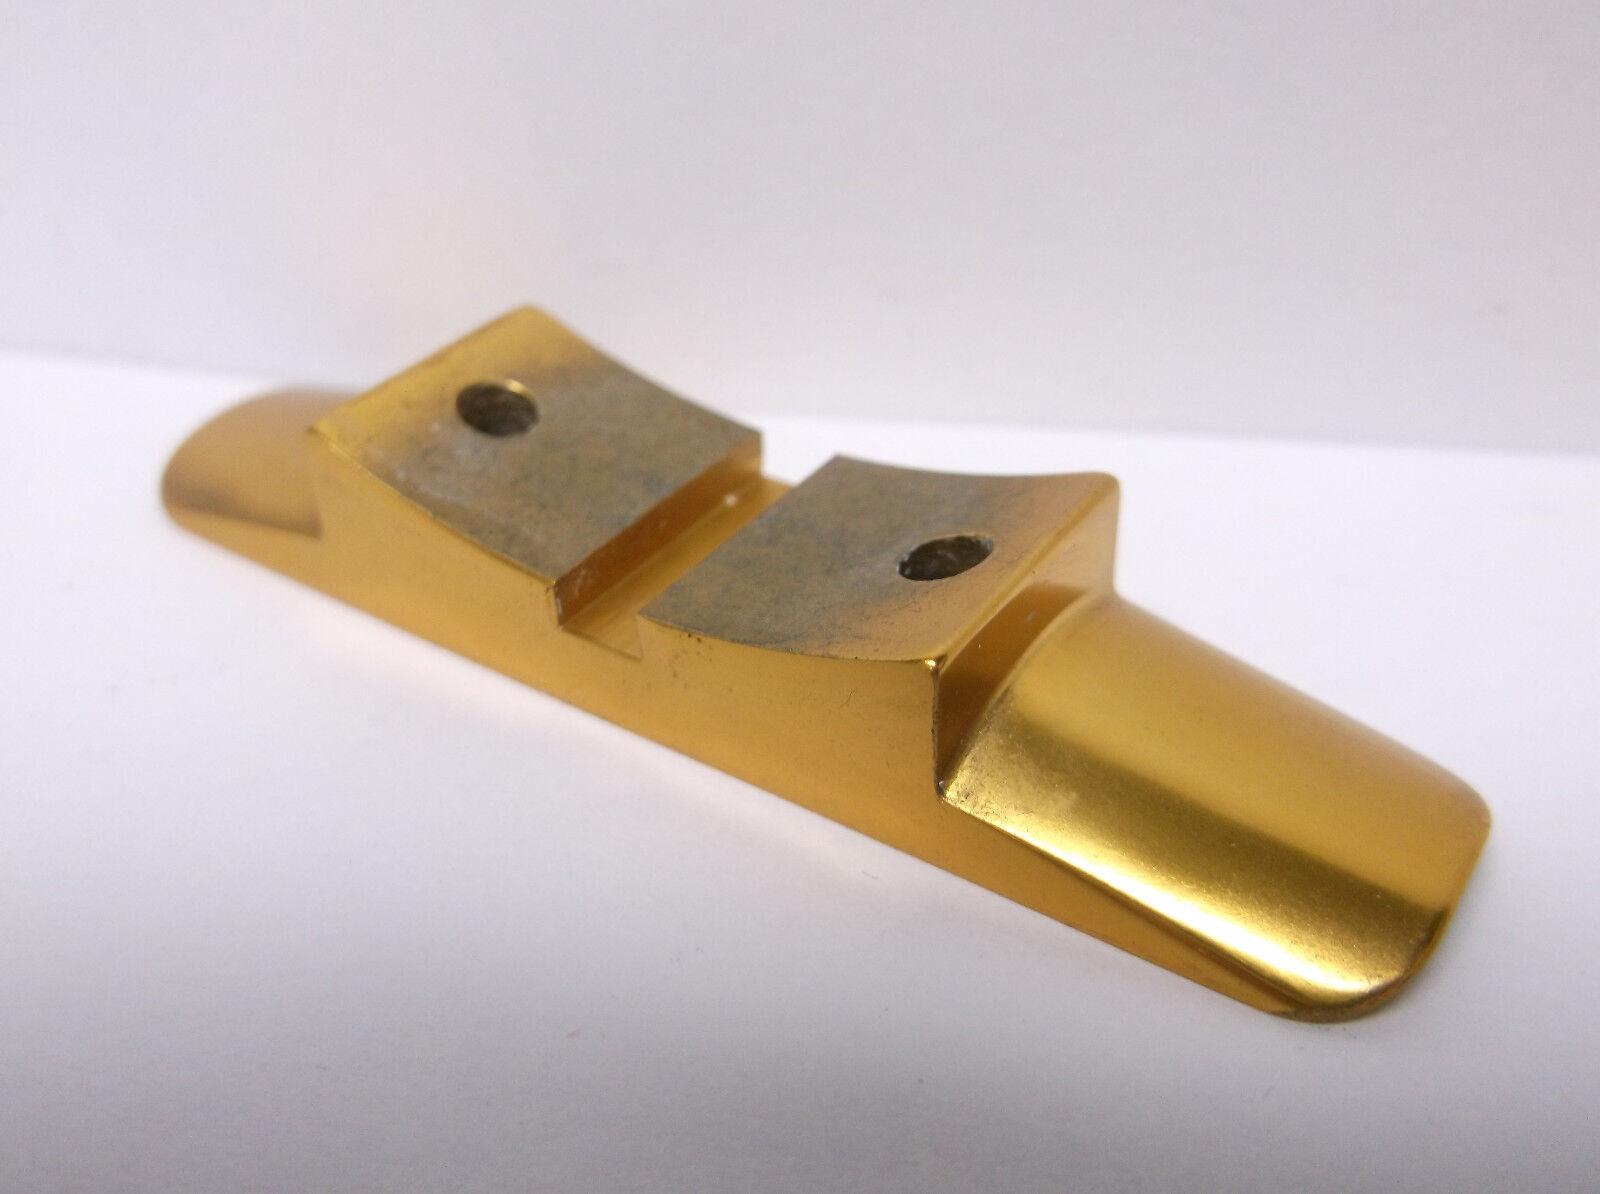 Penn International Fly Reel parte - 30-2.5FRG 2.5G - Stand-Acabado en oro